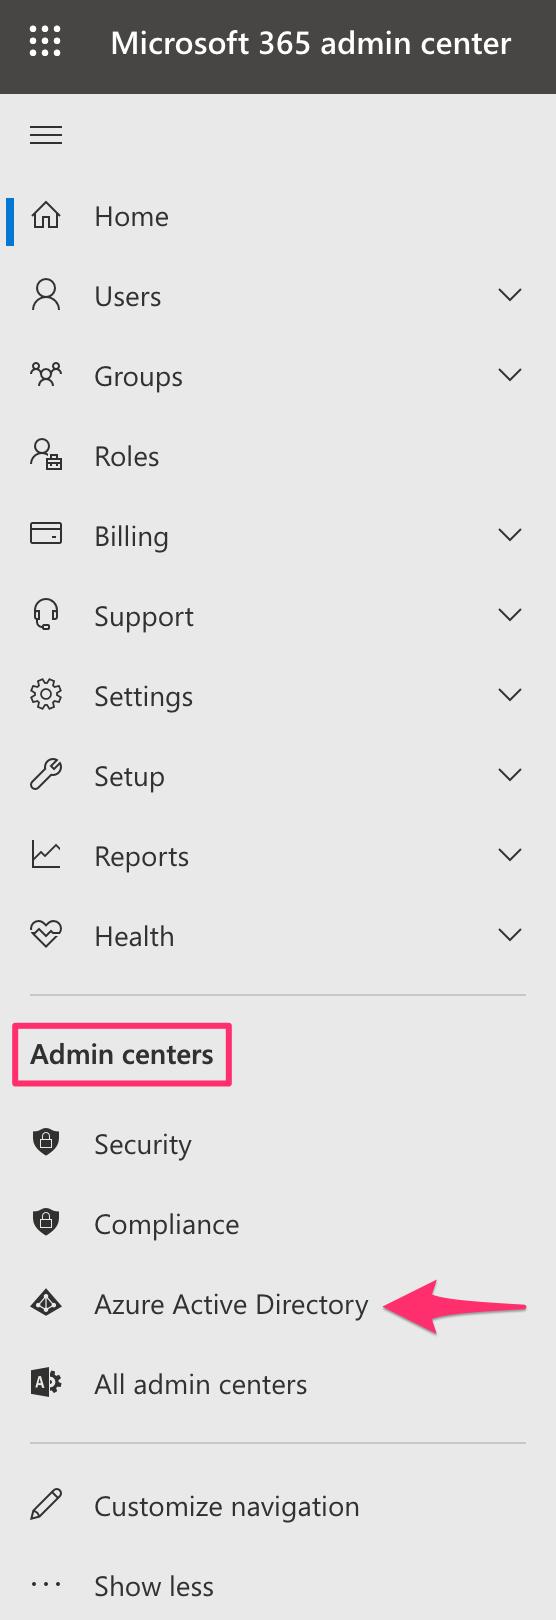 Microsoft_365_admin_center_-_Home11.png